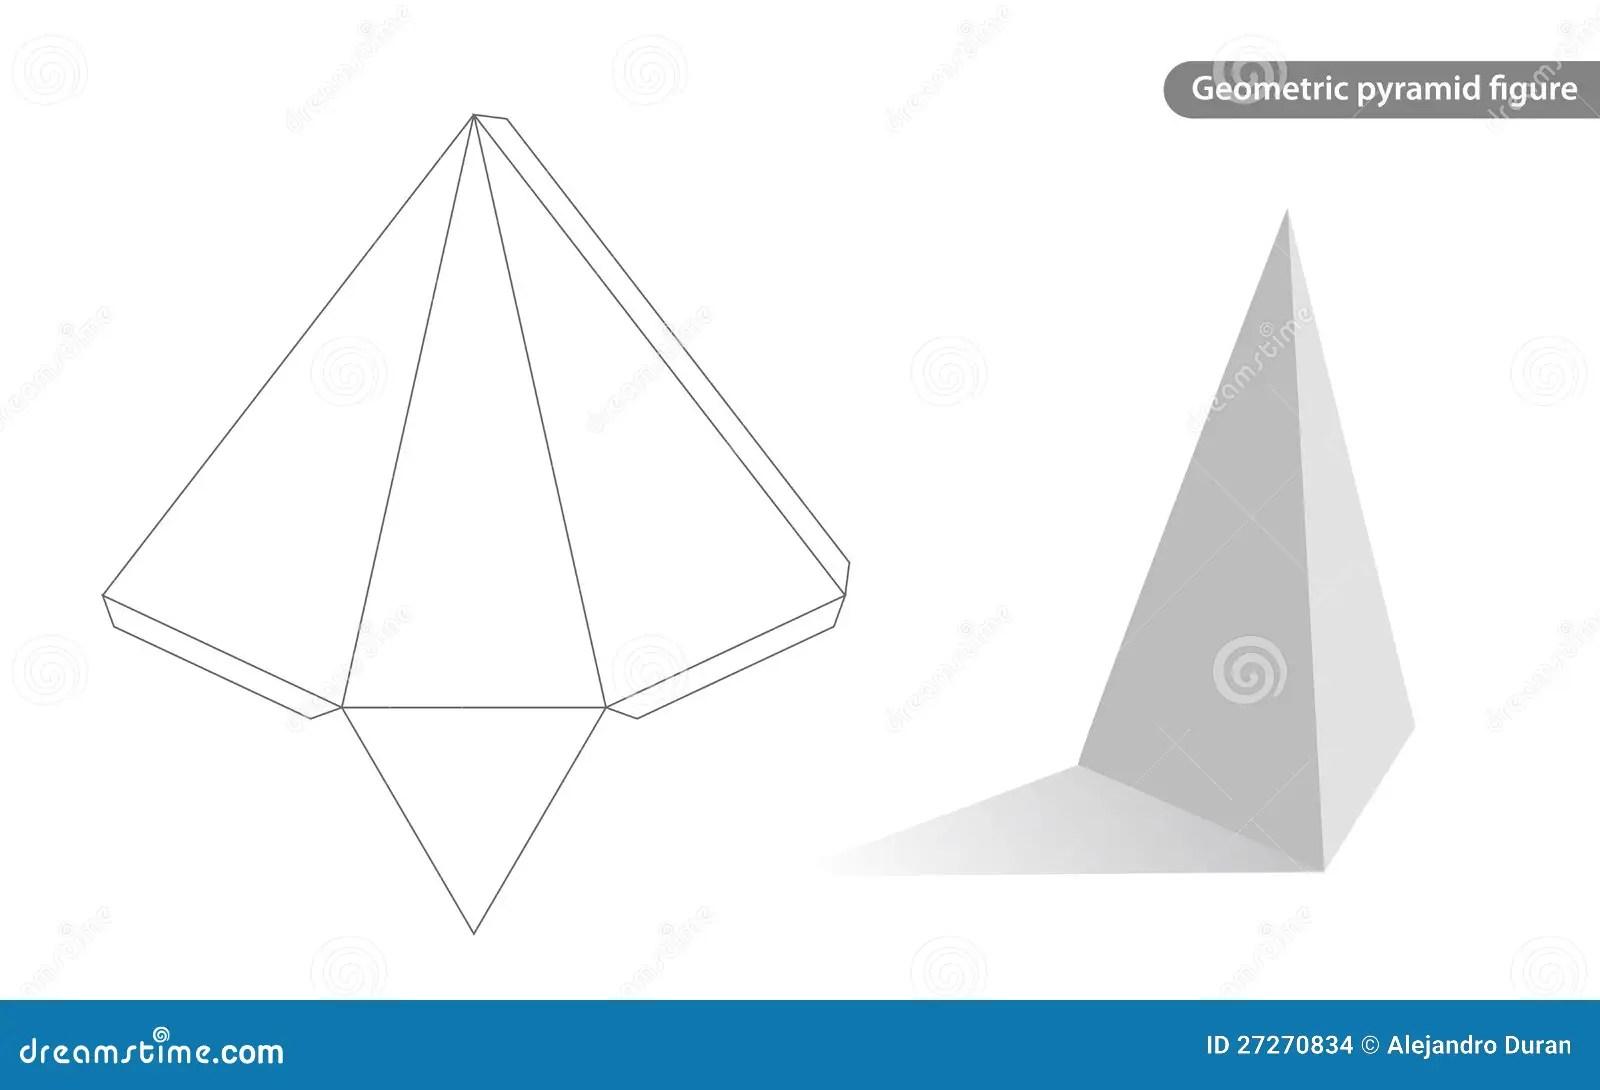 blank pyramid diagram 5 trs female wiring geometric stock vector illustration of